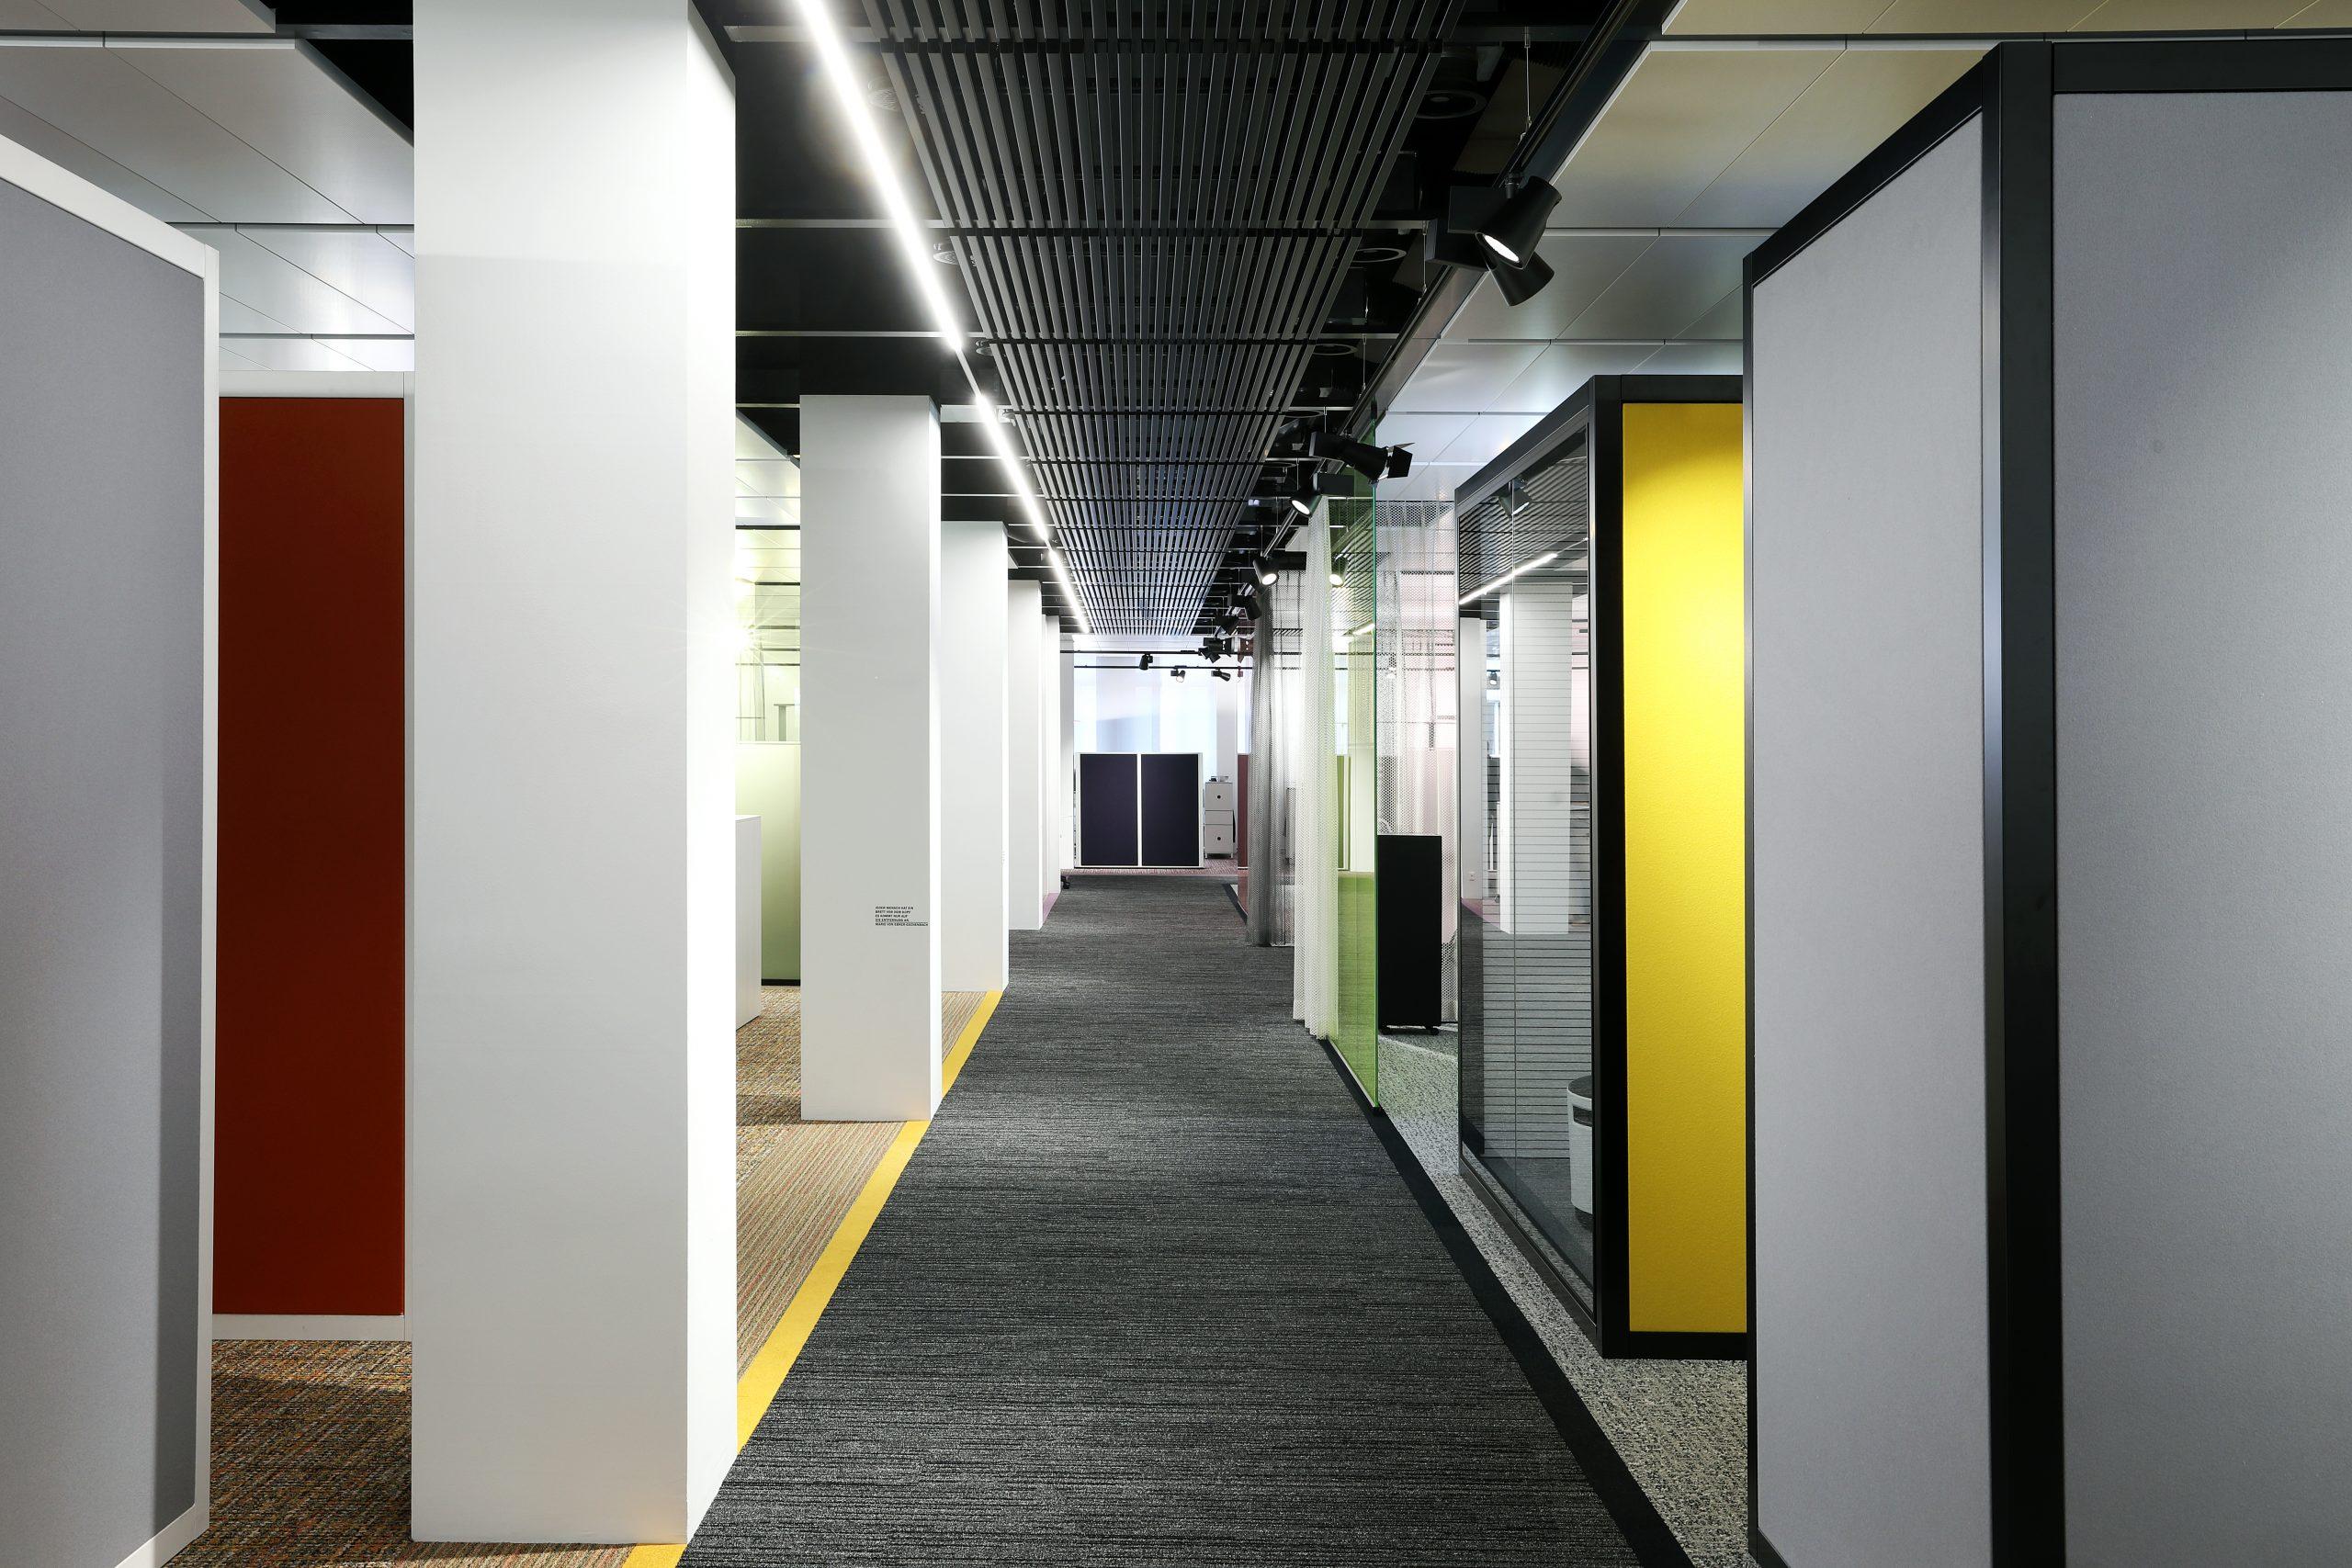 Büroeinrichtung - Büroplanung - Innenausbau | WSA